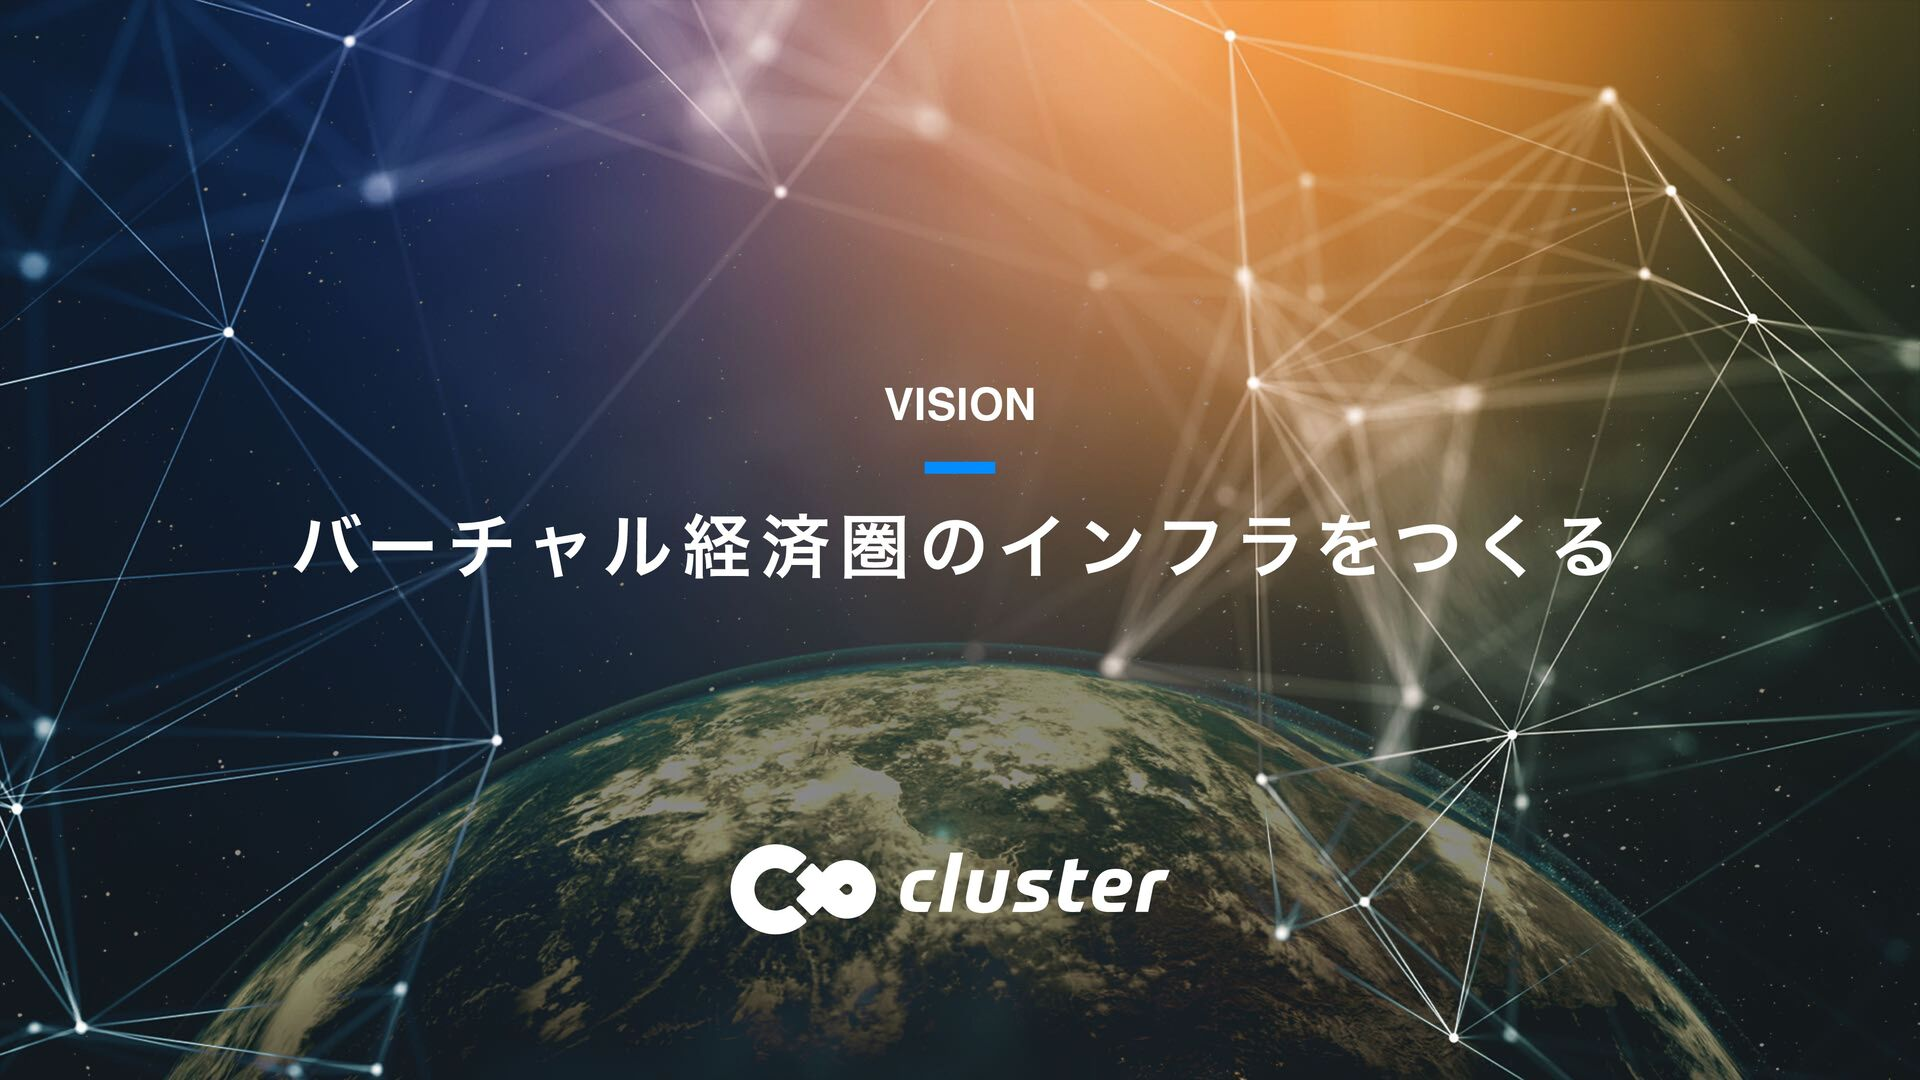 Cluster, Inc. All Rights Reserved. ձࣾ֓ཁ 6 ਓ ྨ ͷ...